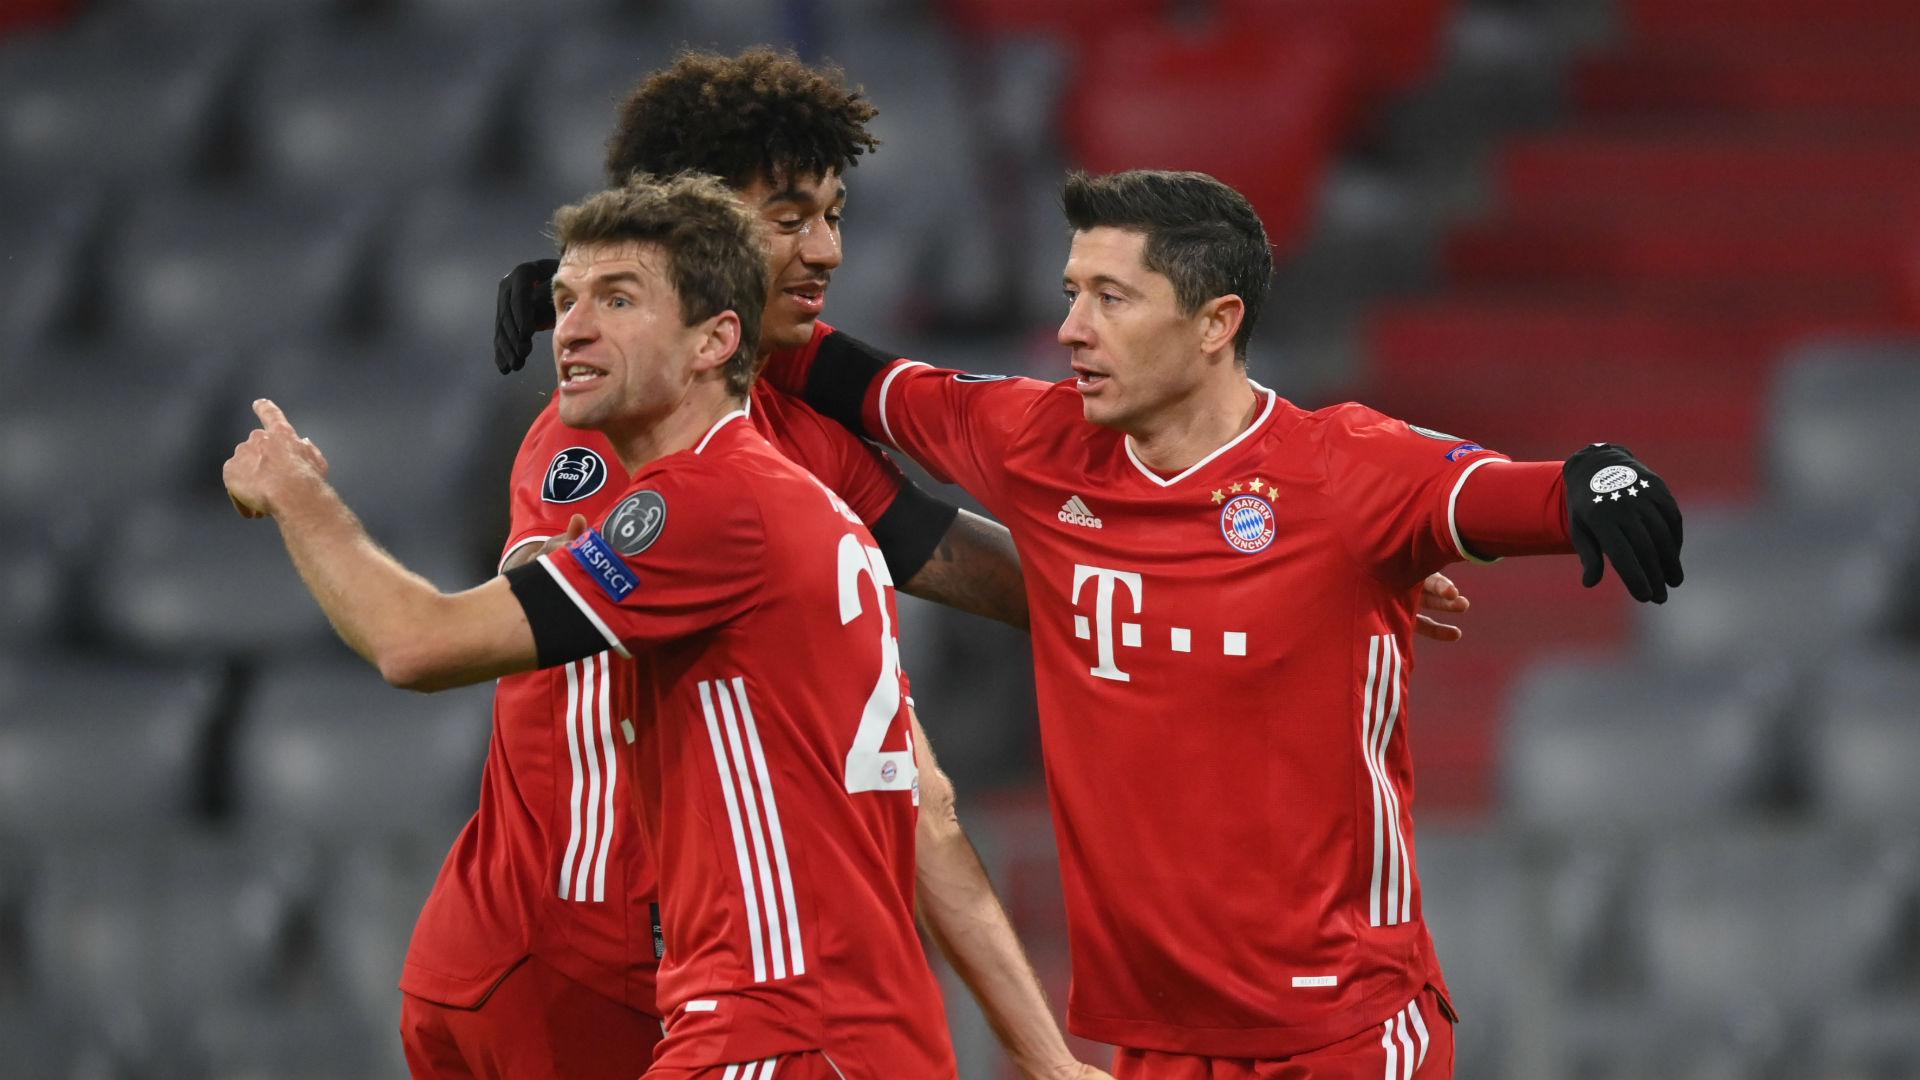 Bayern Munich 3-1 Salzburg: Lewandowski joins elite company as Flick's men seal last-16 spot